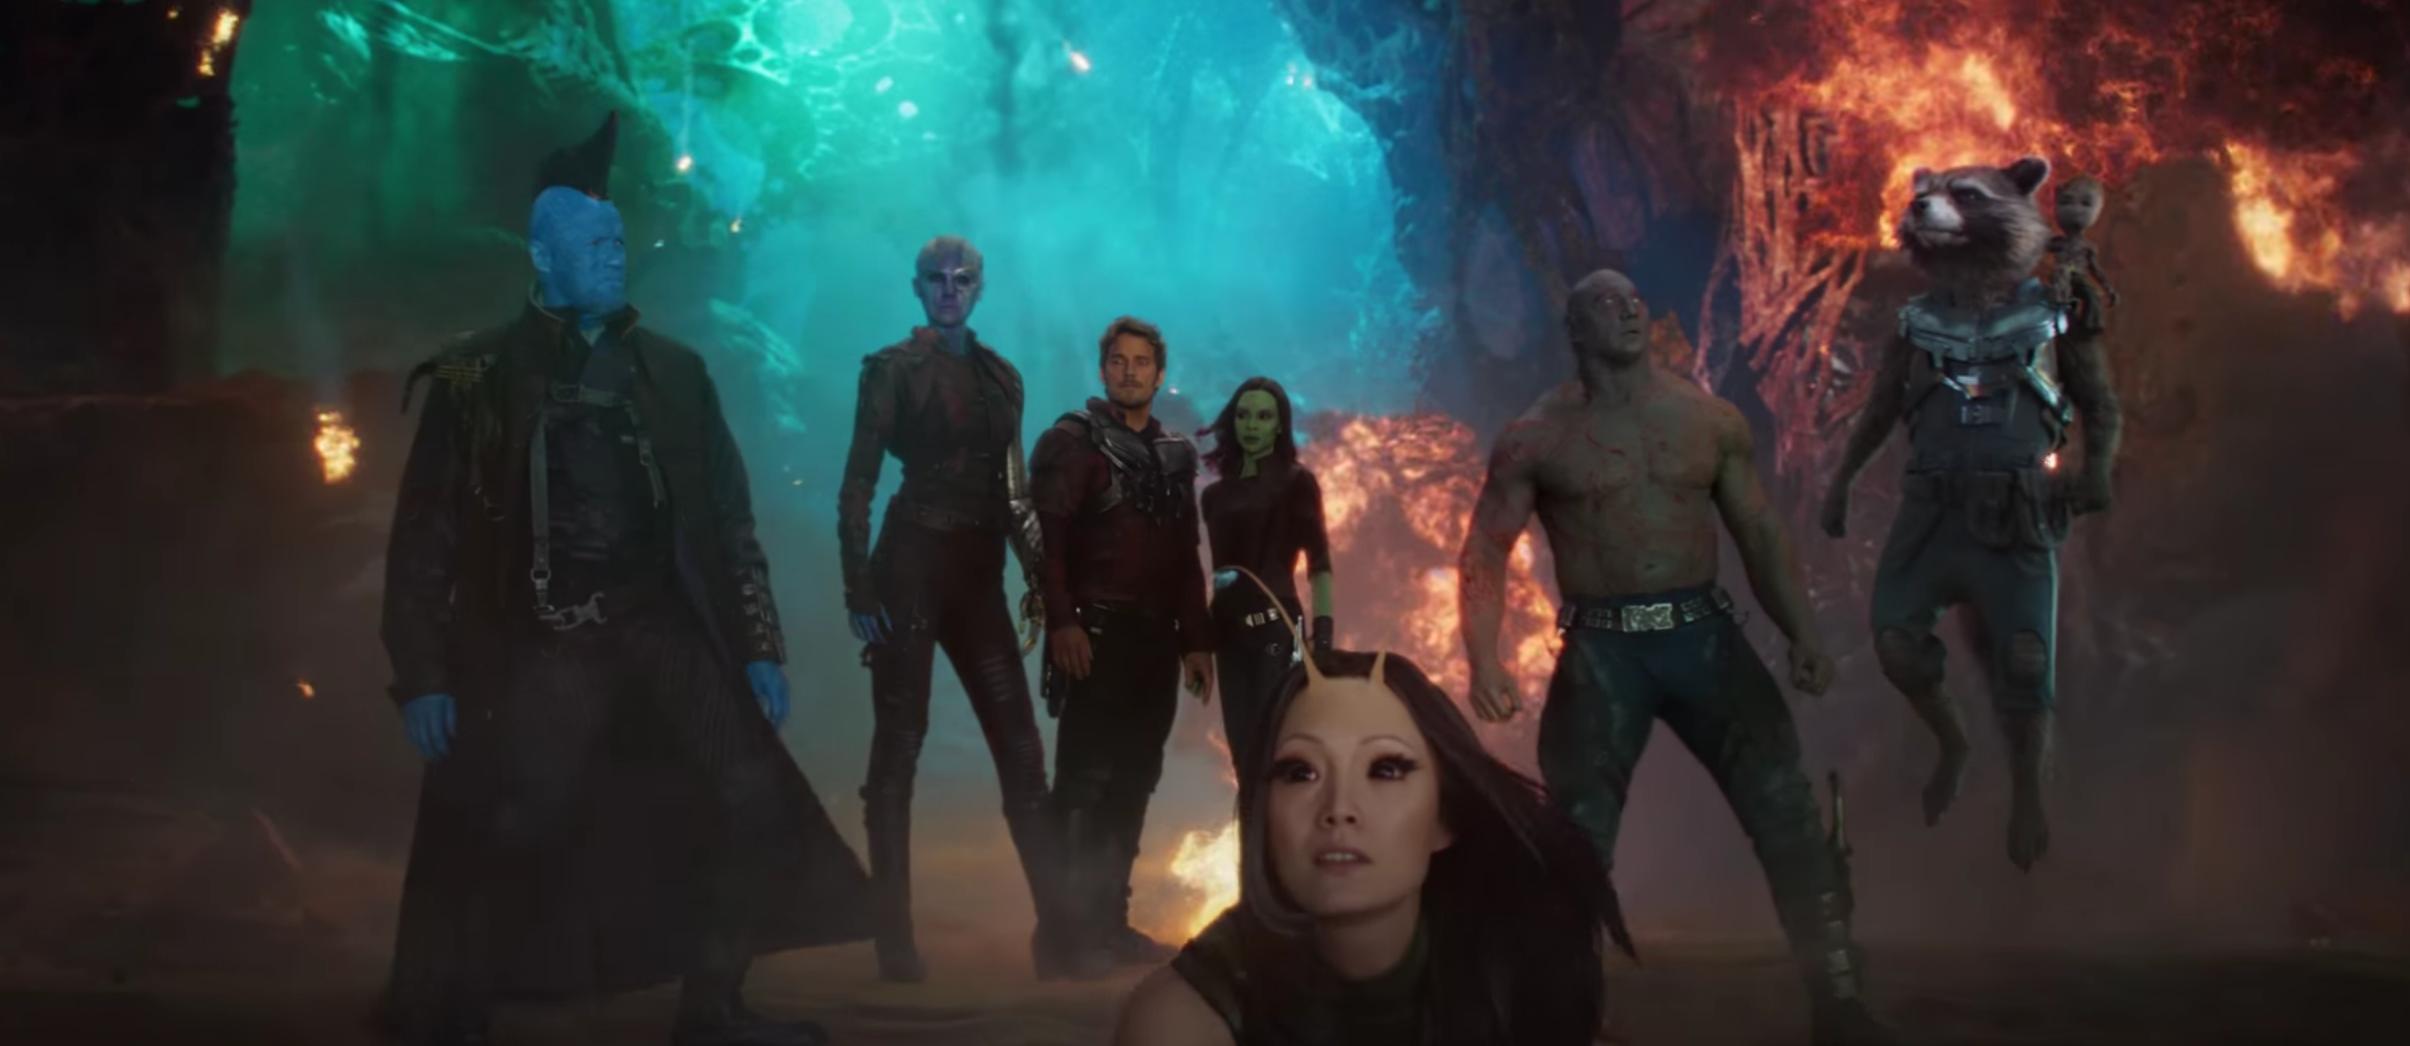 Guardians Of The Galaxy Vol. 2 Stream Kinox